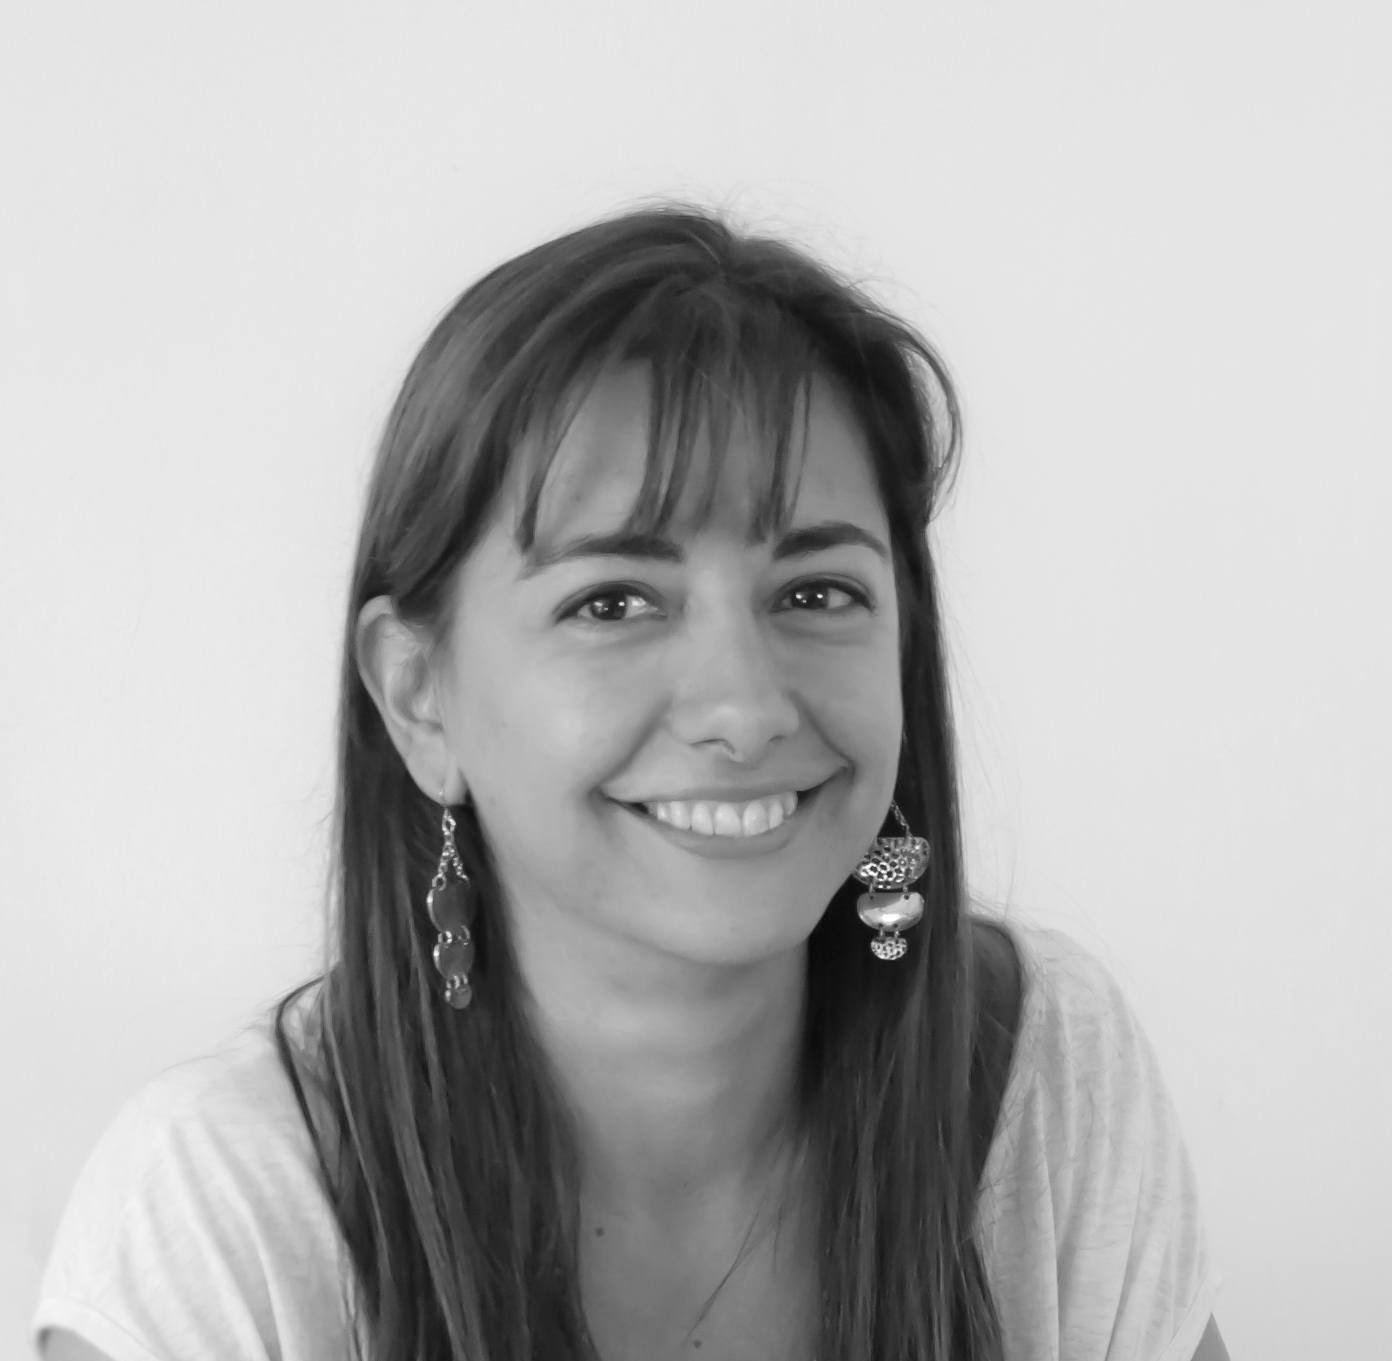 Cdra. Fernanda Pasquini